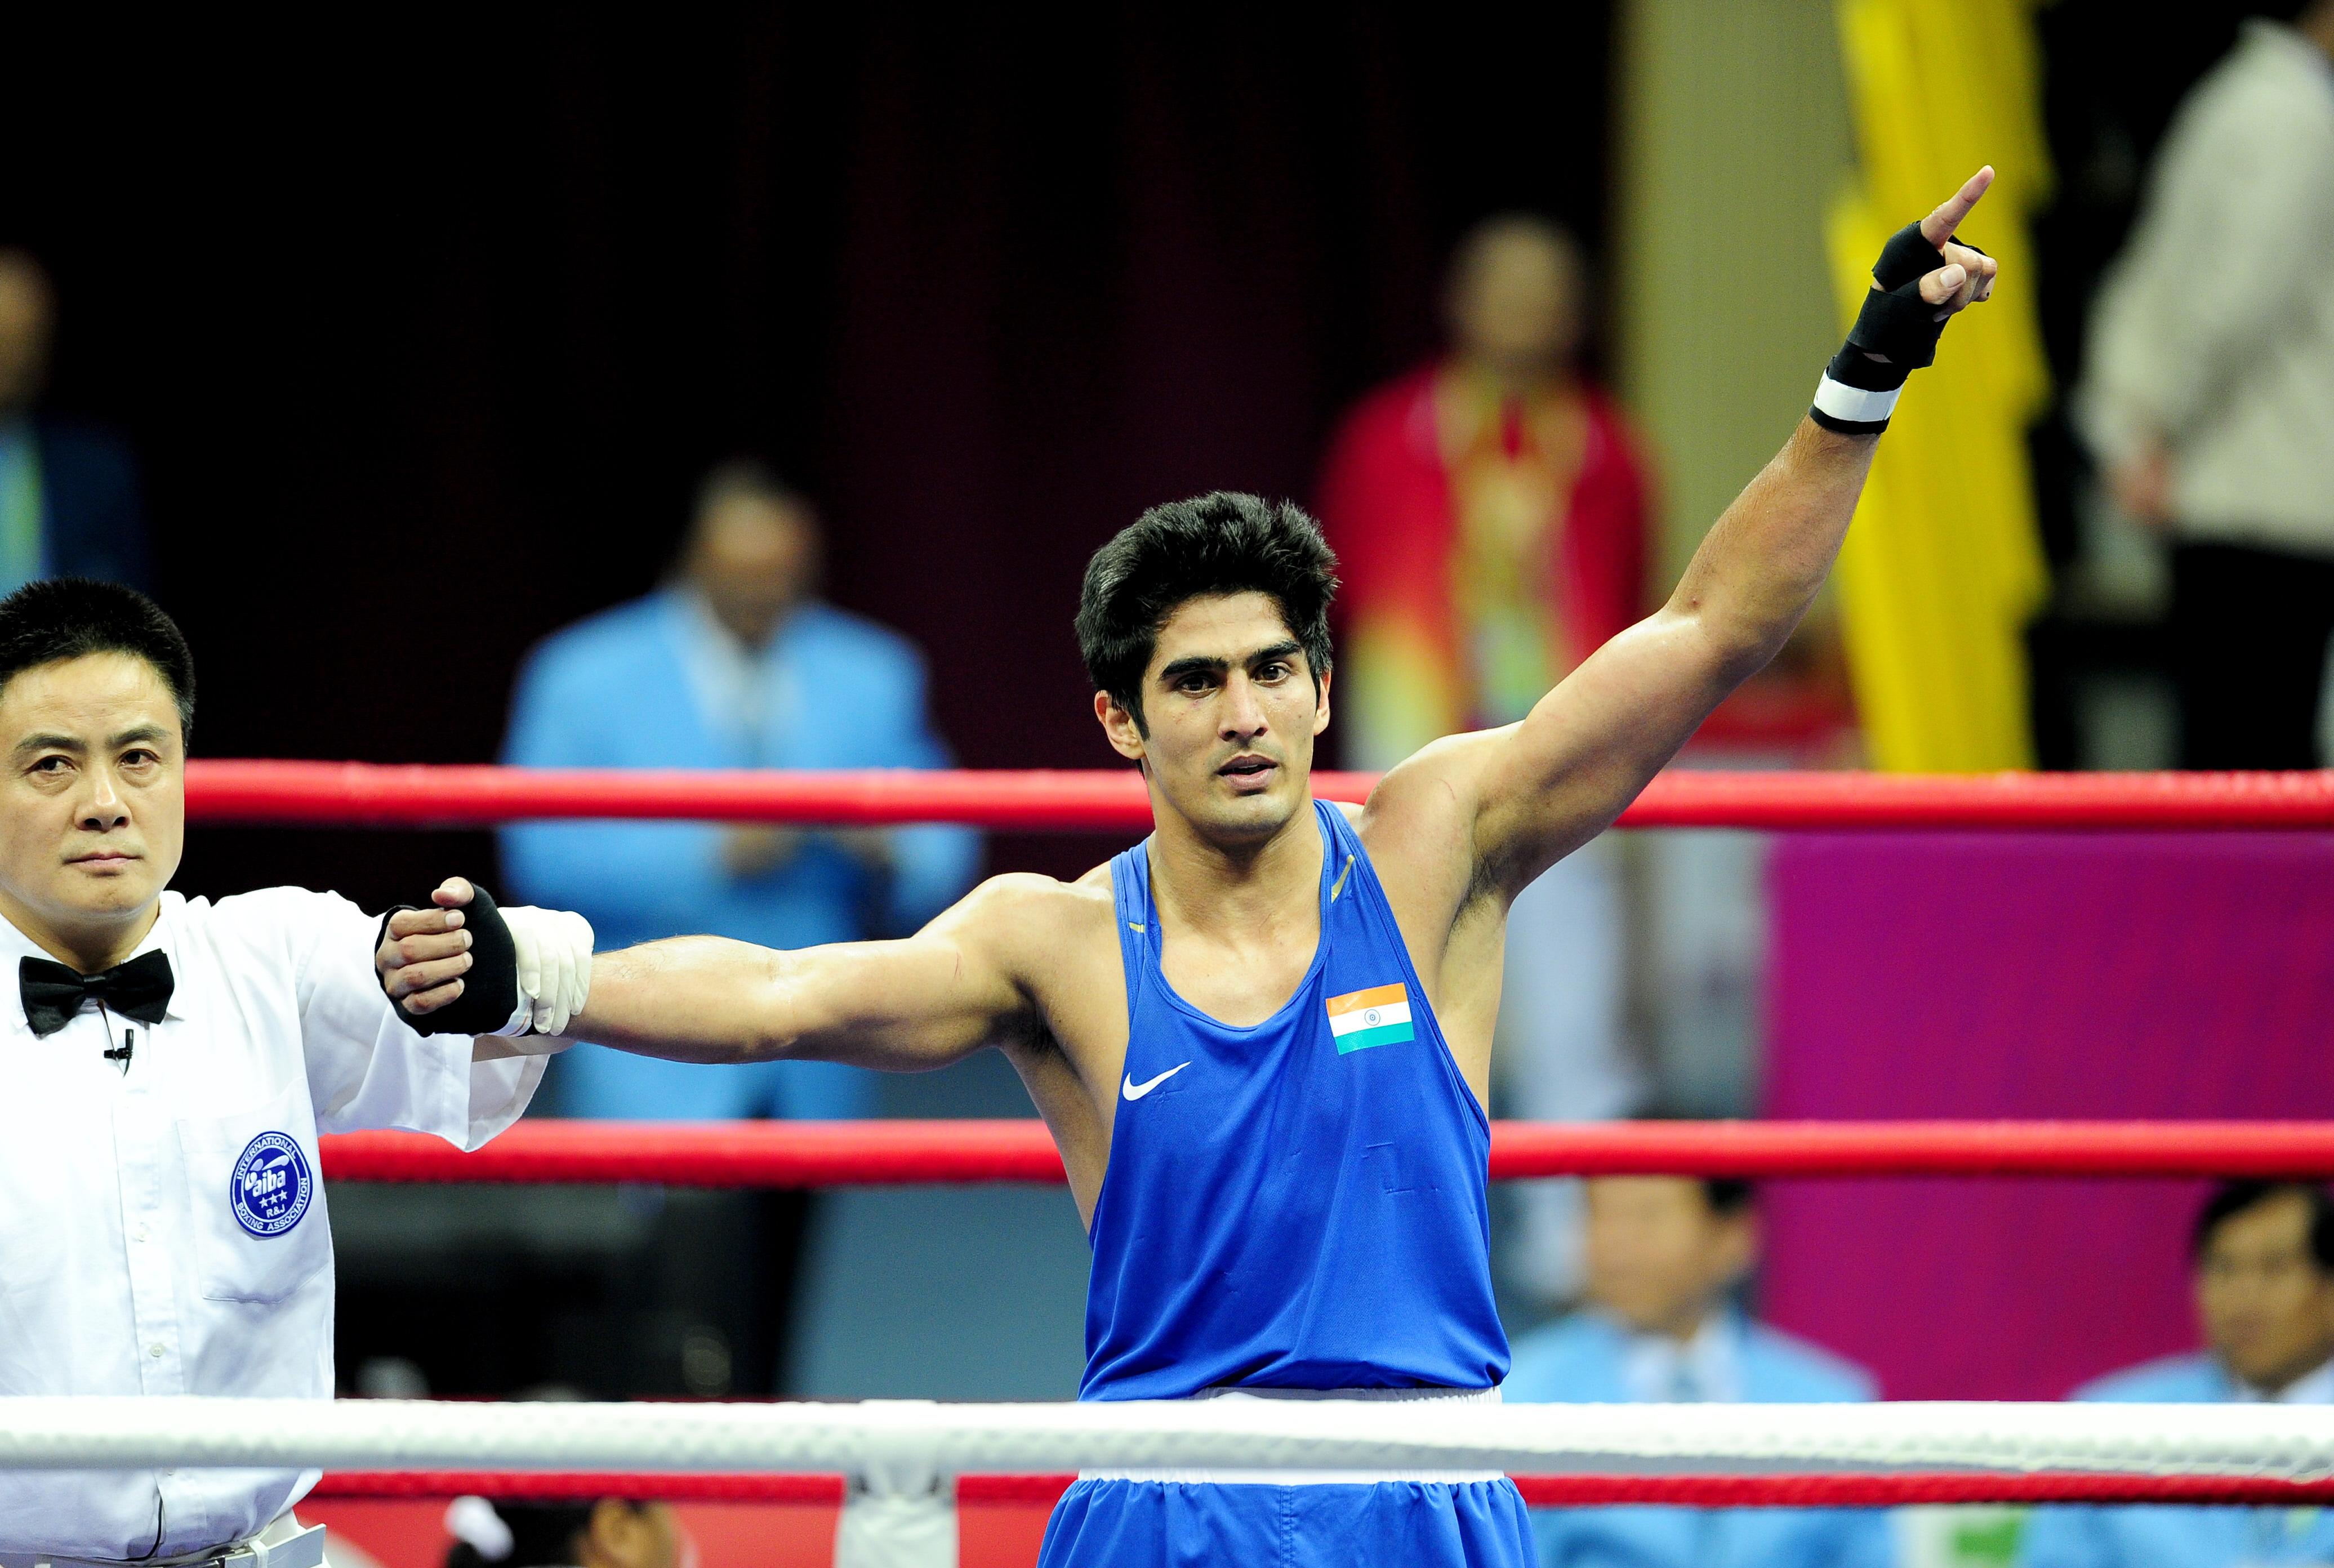 boxing news, indian sports, Vijender Singh vs Sonny Whiting preview, Vijender Singh vs Sonny Whiting time, Vijender Singh vs Sonny Whiting channel